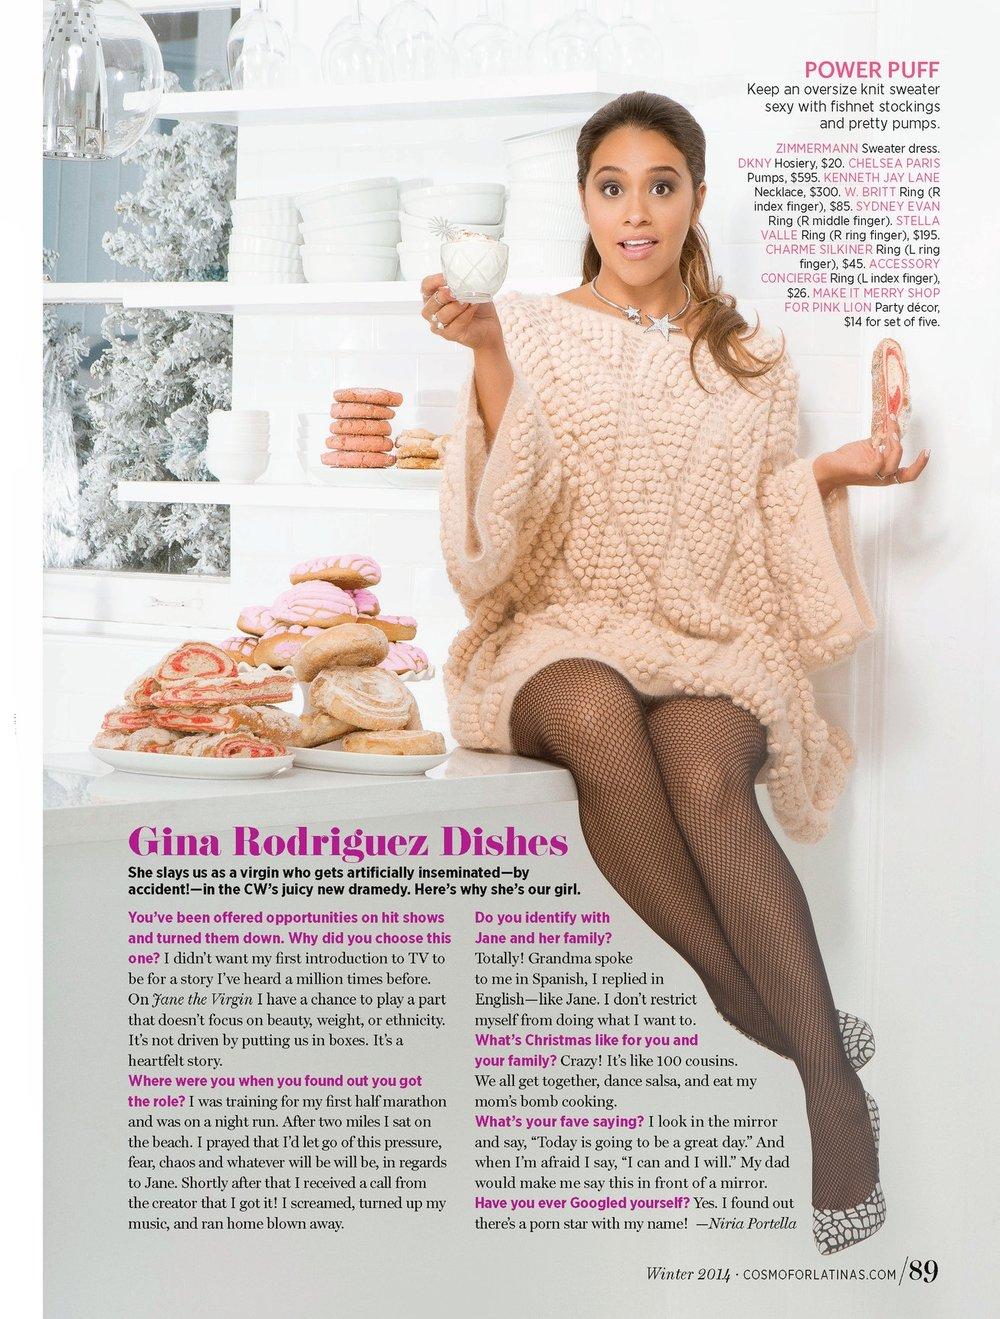 Cosmo for Latinas Magazine, Celebrity Fashion Feature (Gina Rodriguez). Photo: Sheryl Nields.